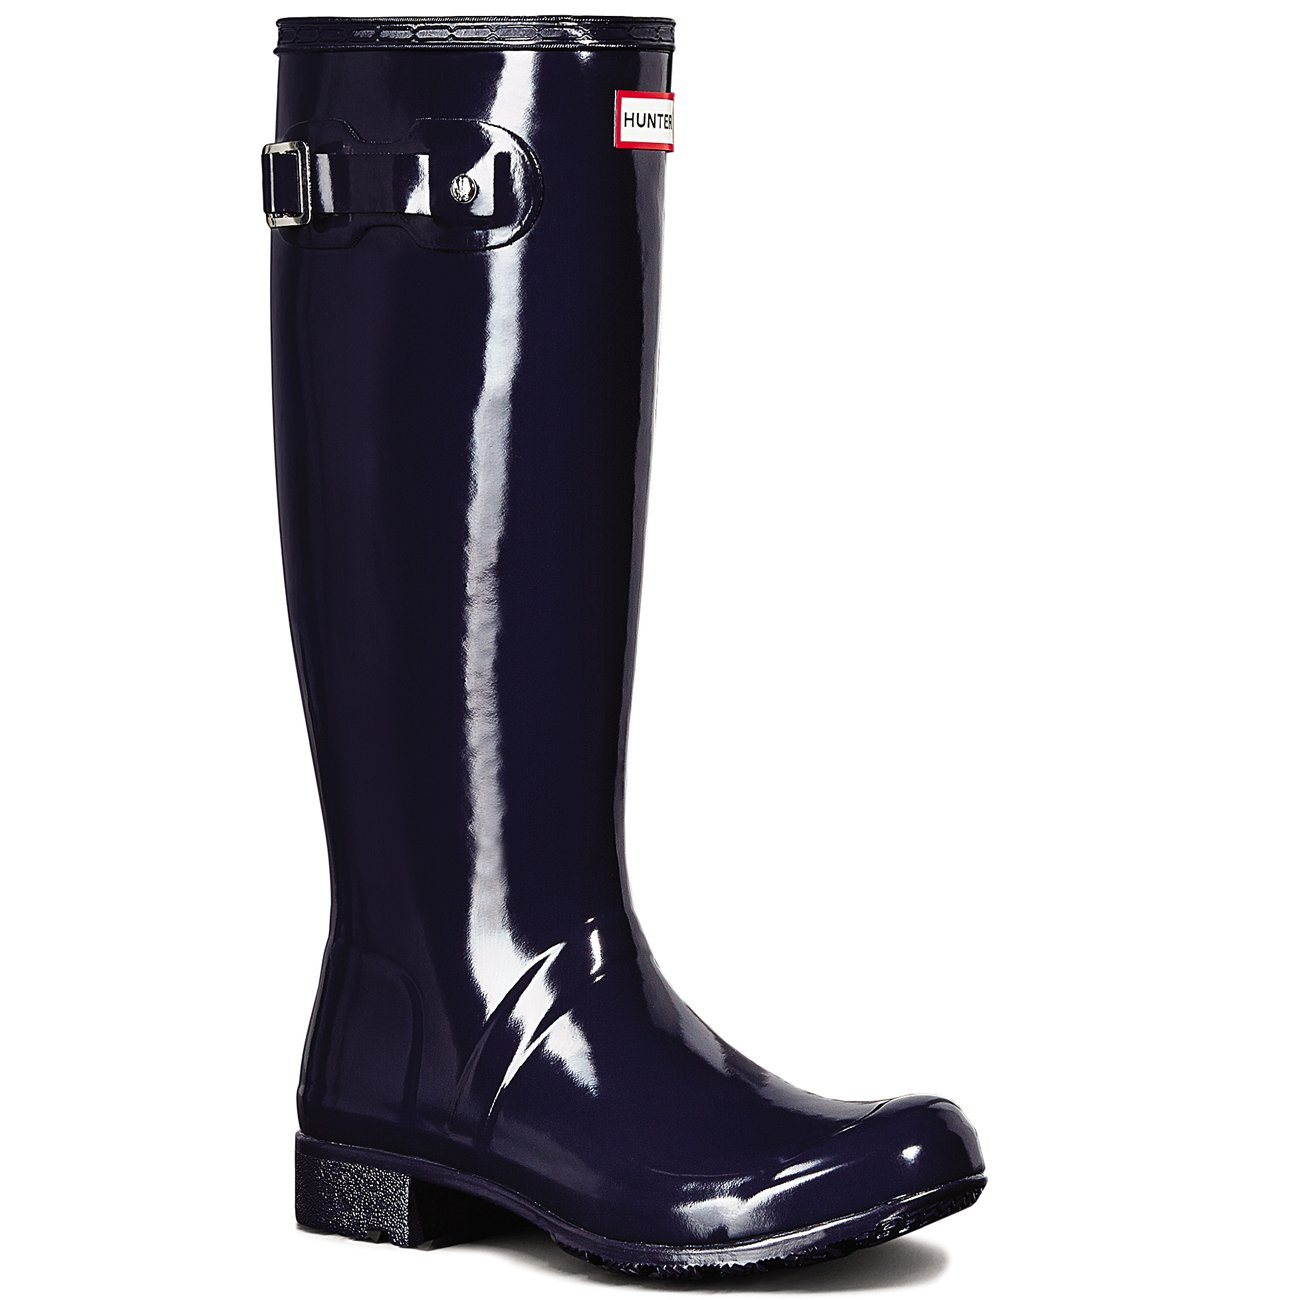 Hunter Womens Original Tour Gloss Waterproof Winter Snow Wellington Boot - Midnight - 9-40/41